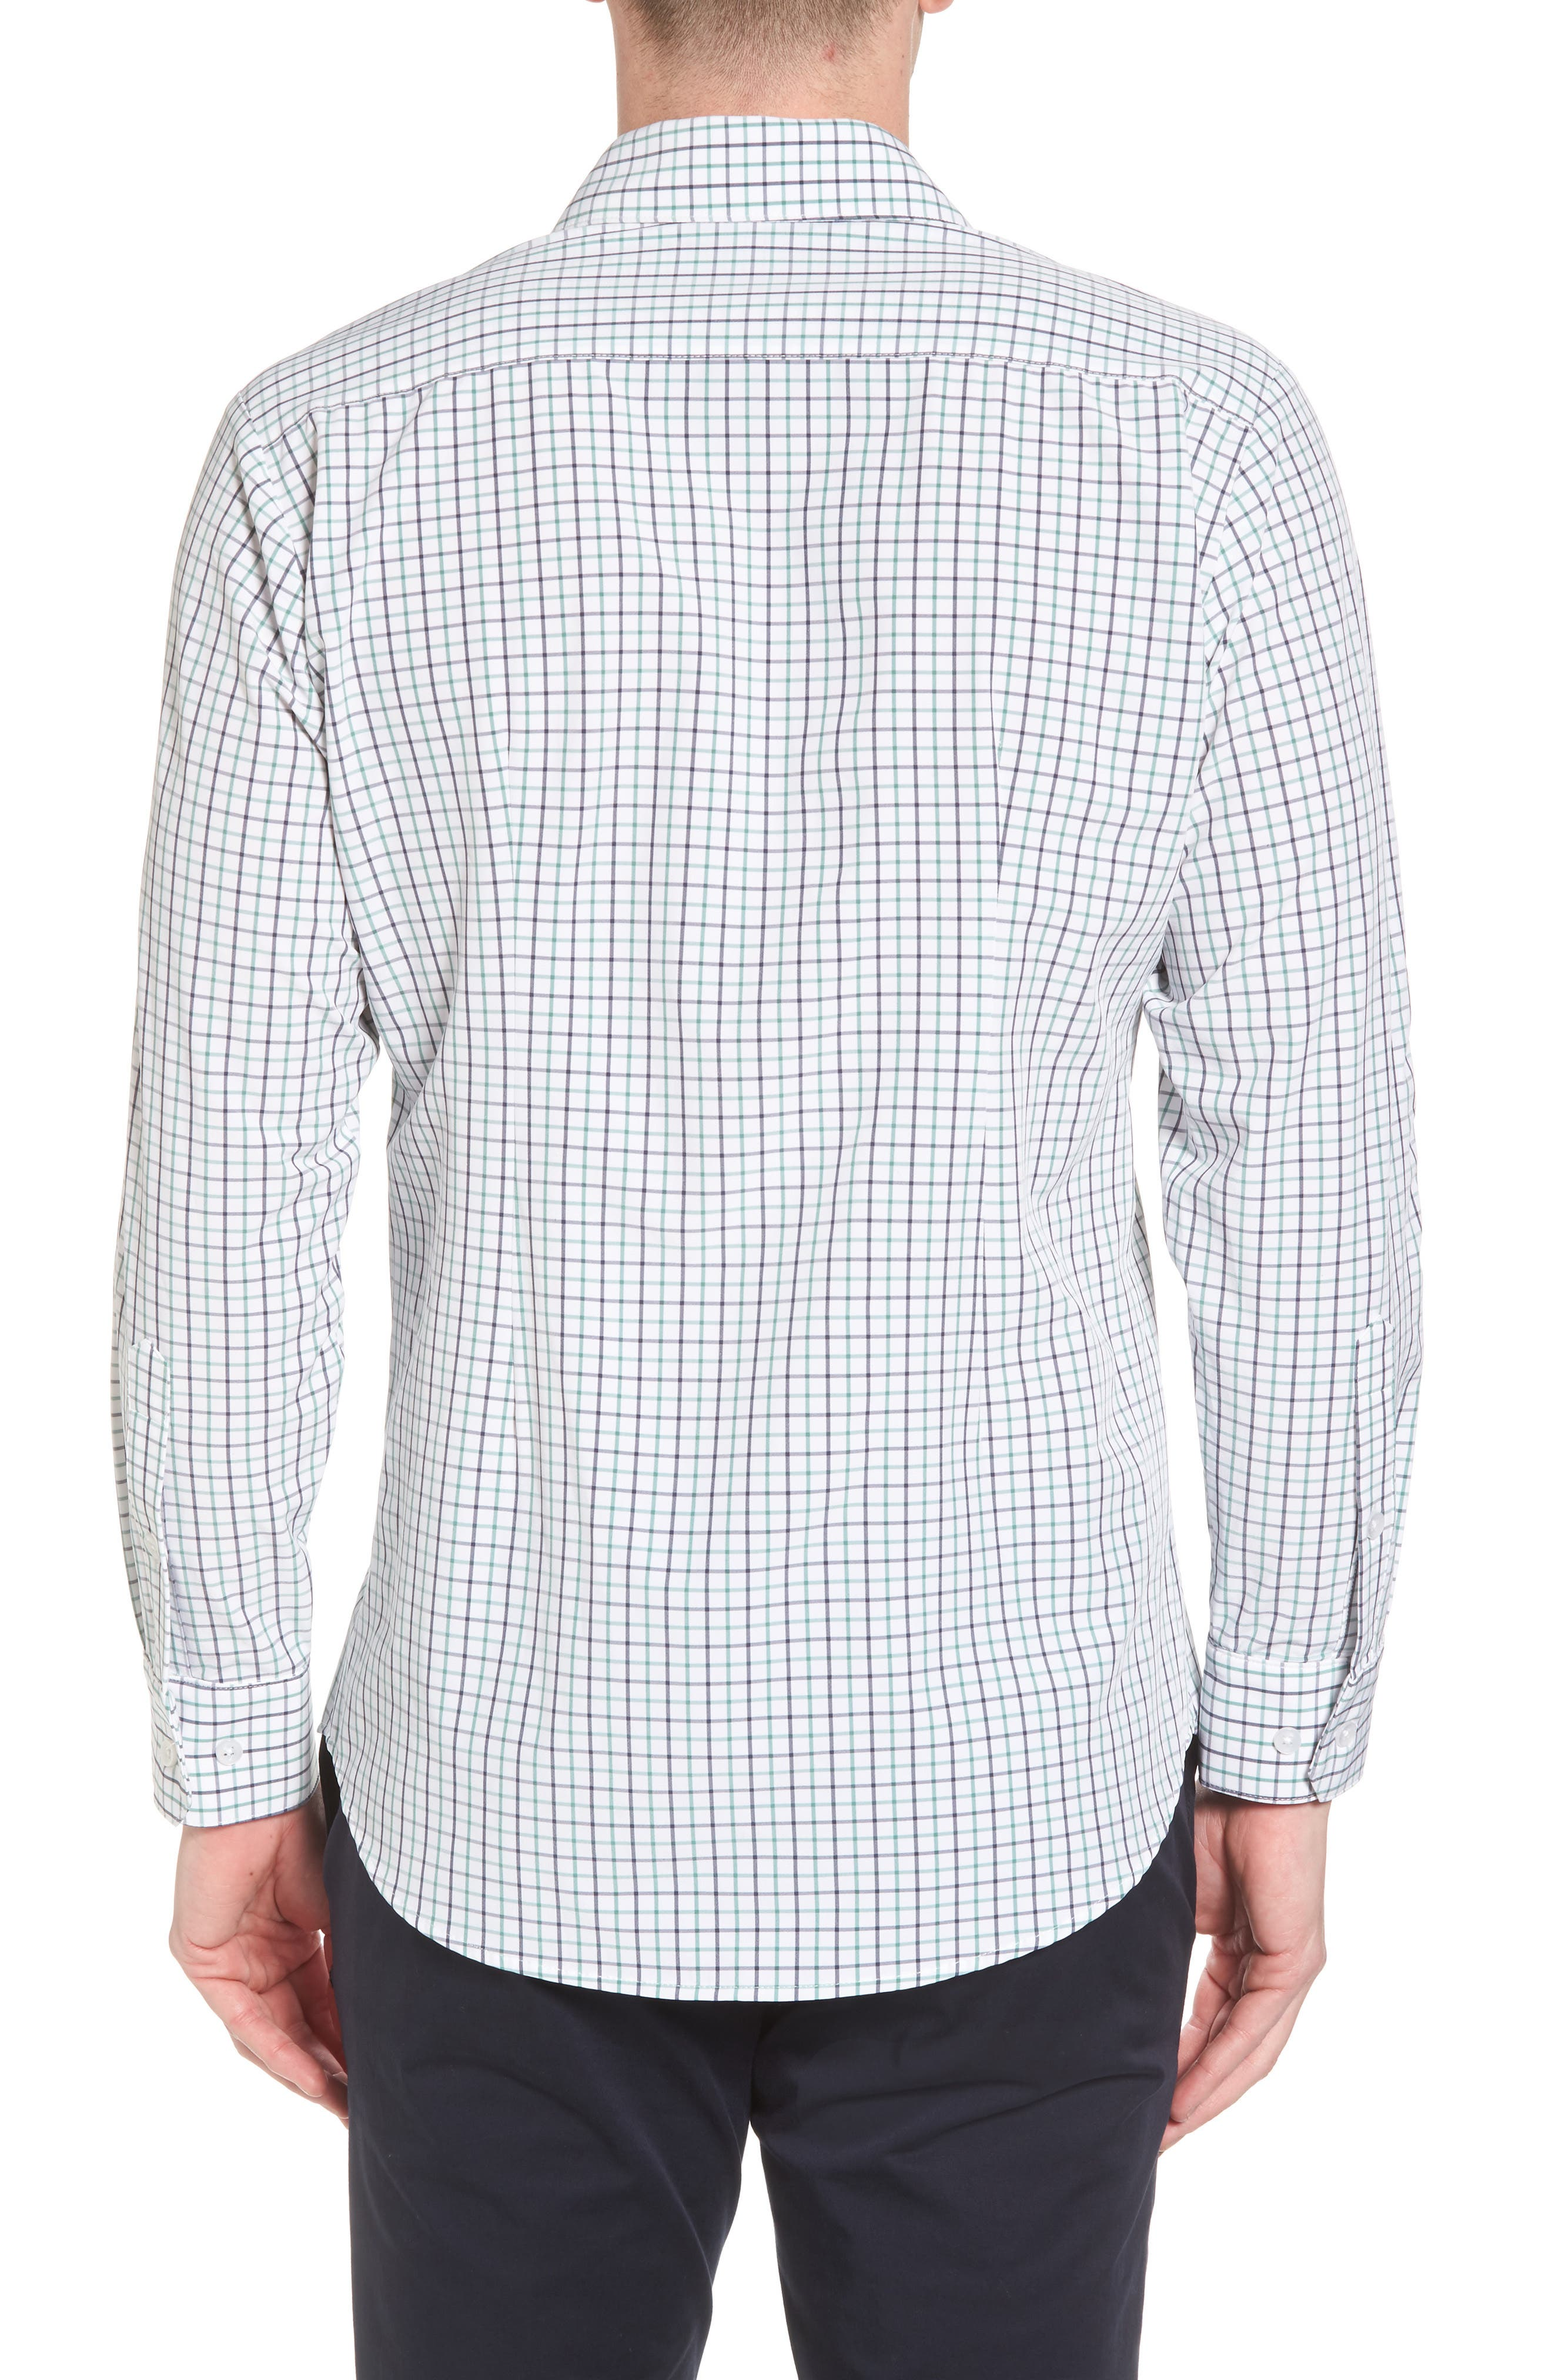 Ellis Slim Fit Tattersall Sport Shirt,                             Alternate thumbnail 2, color,                             360